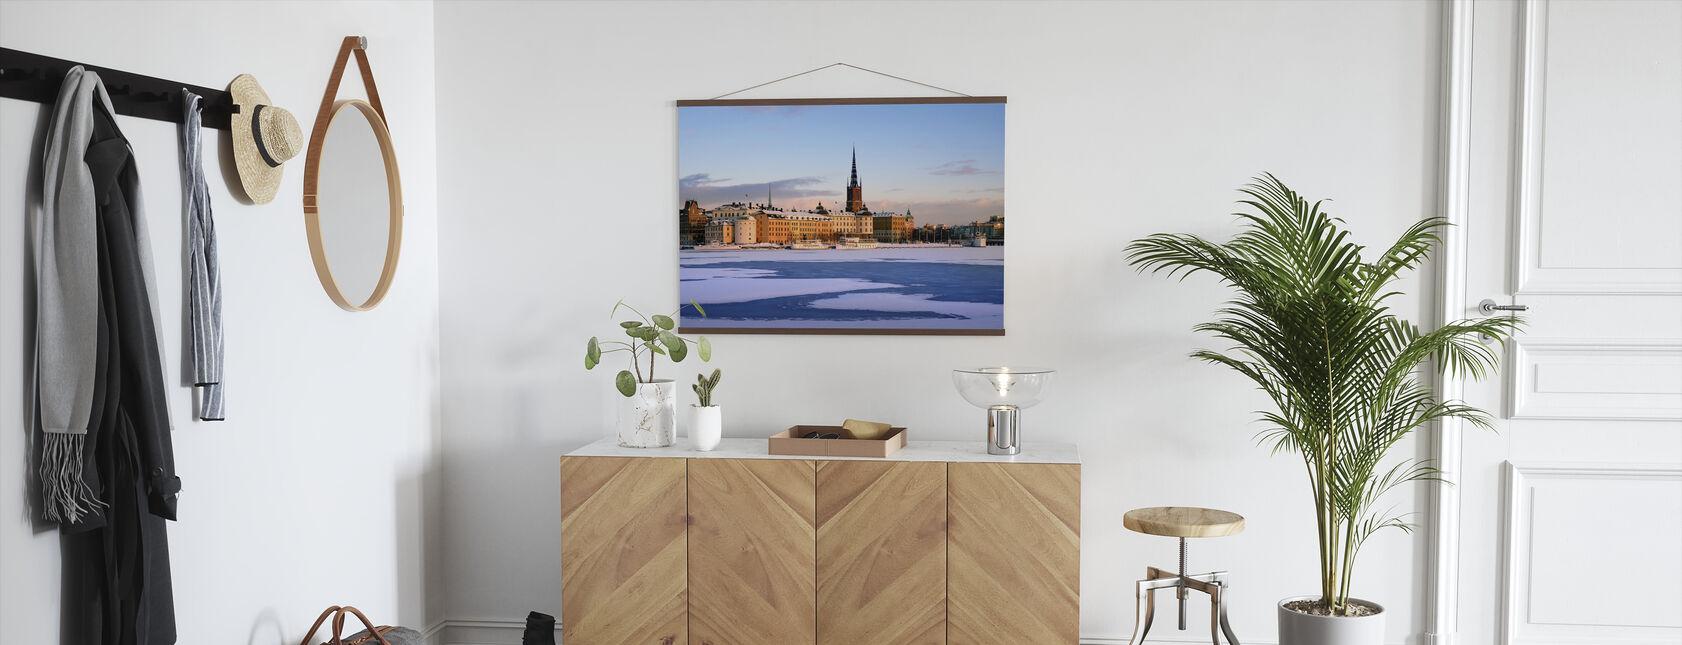 Winter in Stockholm, Sweden - Poster - Hallway